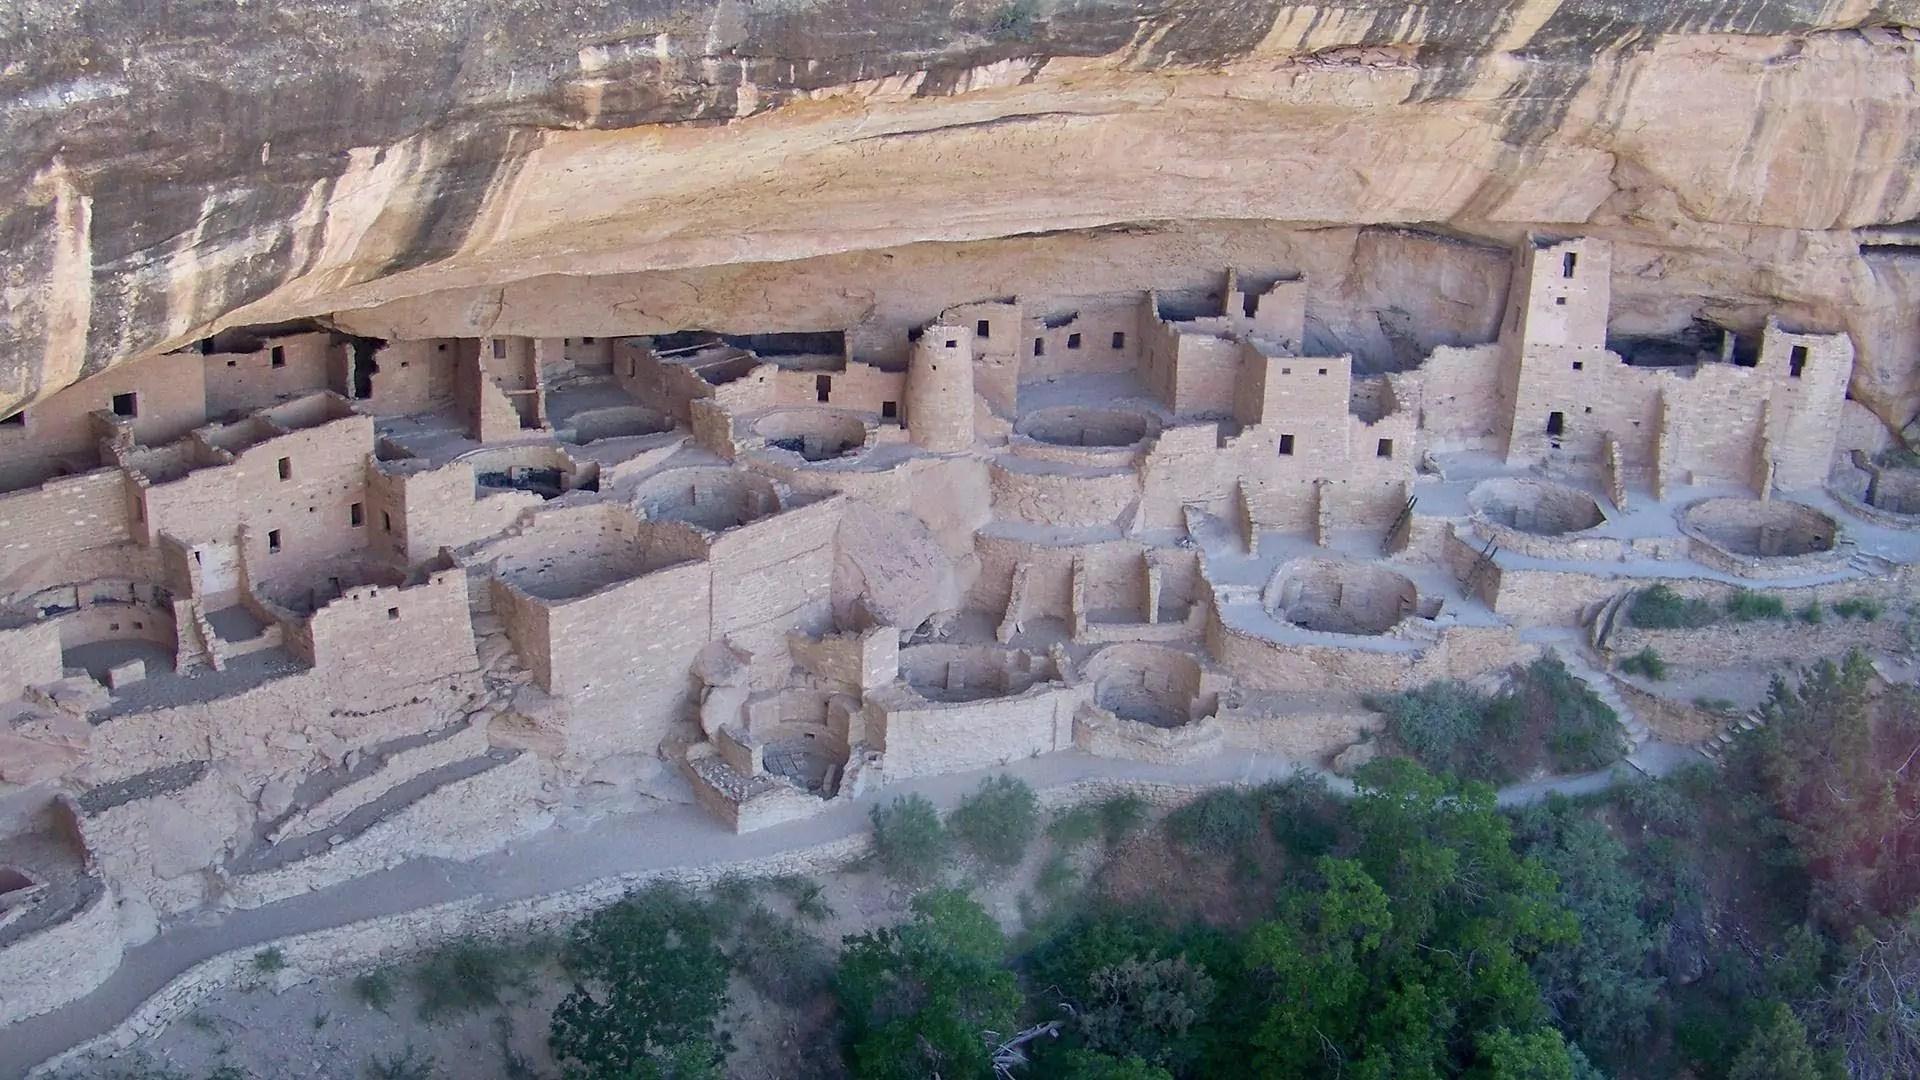 Structures of a Pueblo village next to a cliff.